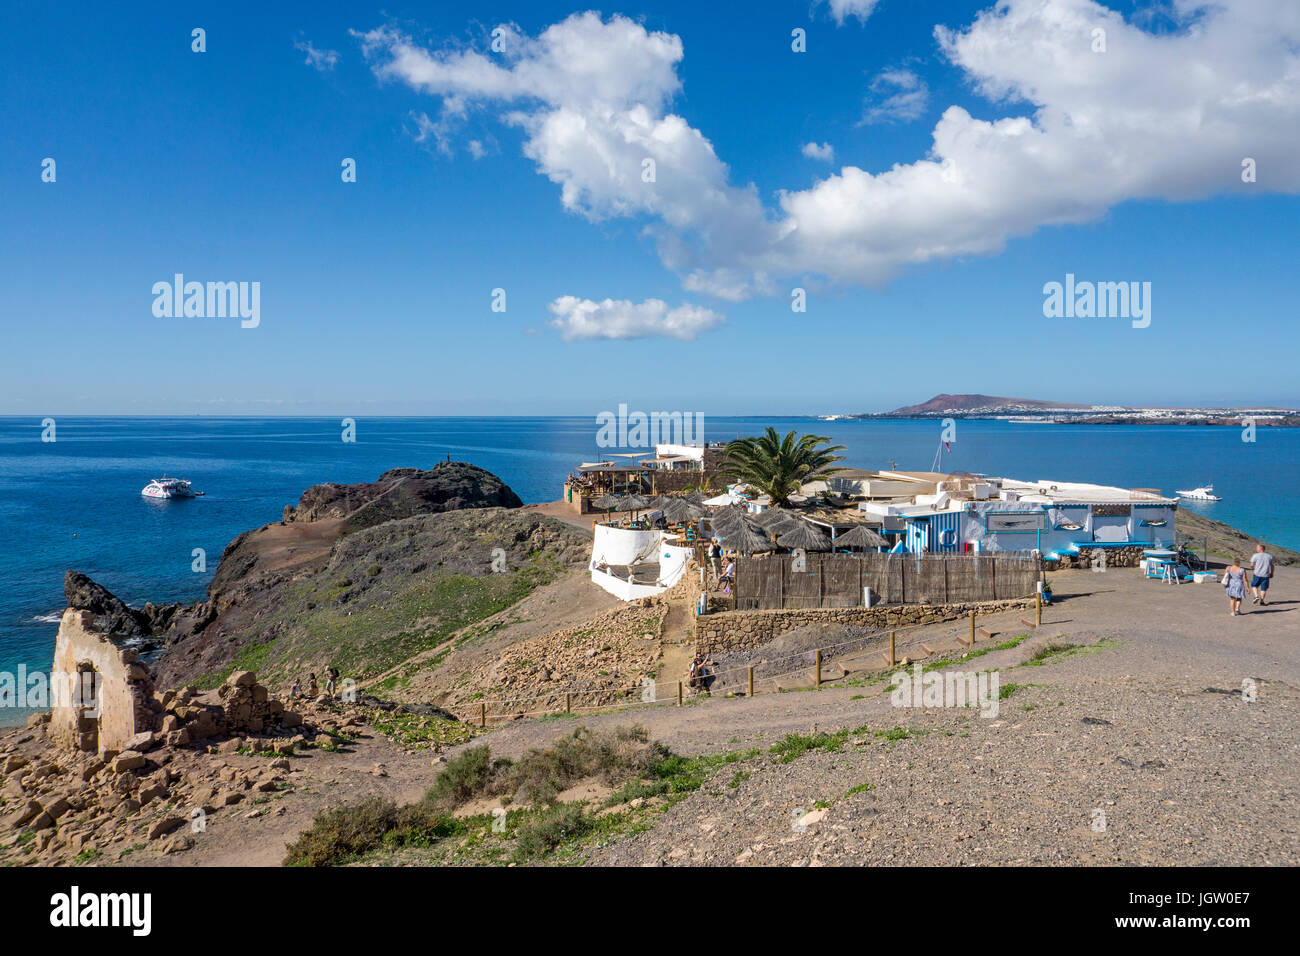 Gastronomie à Playa de Papagayo, Punta Papagayo, Playa Blanca, Lanzarote, îles Canaries, Espagne, Europe Photo Stock